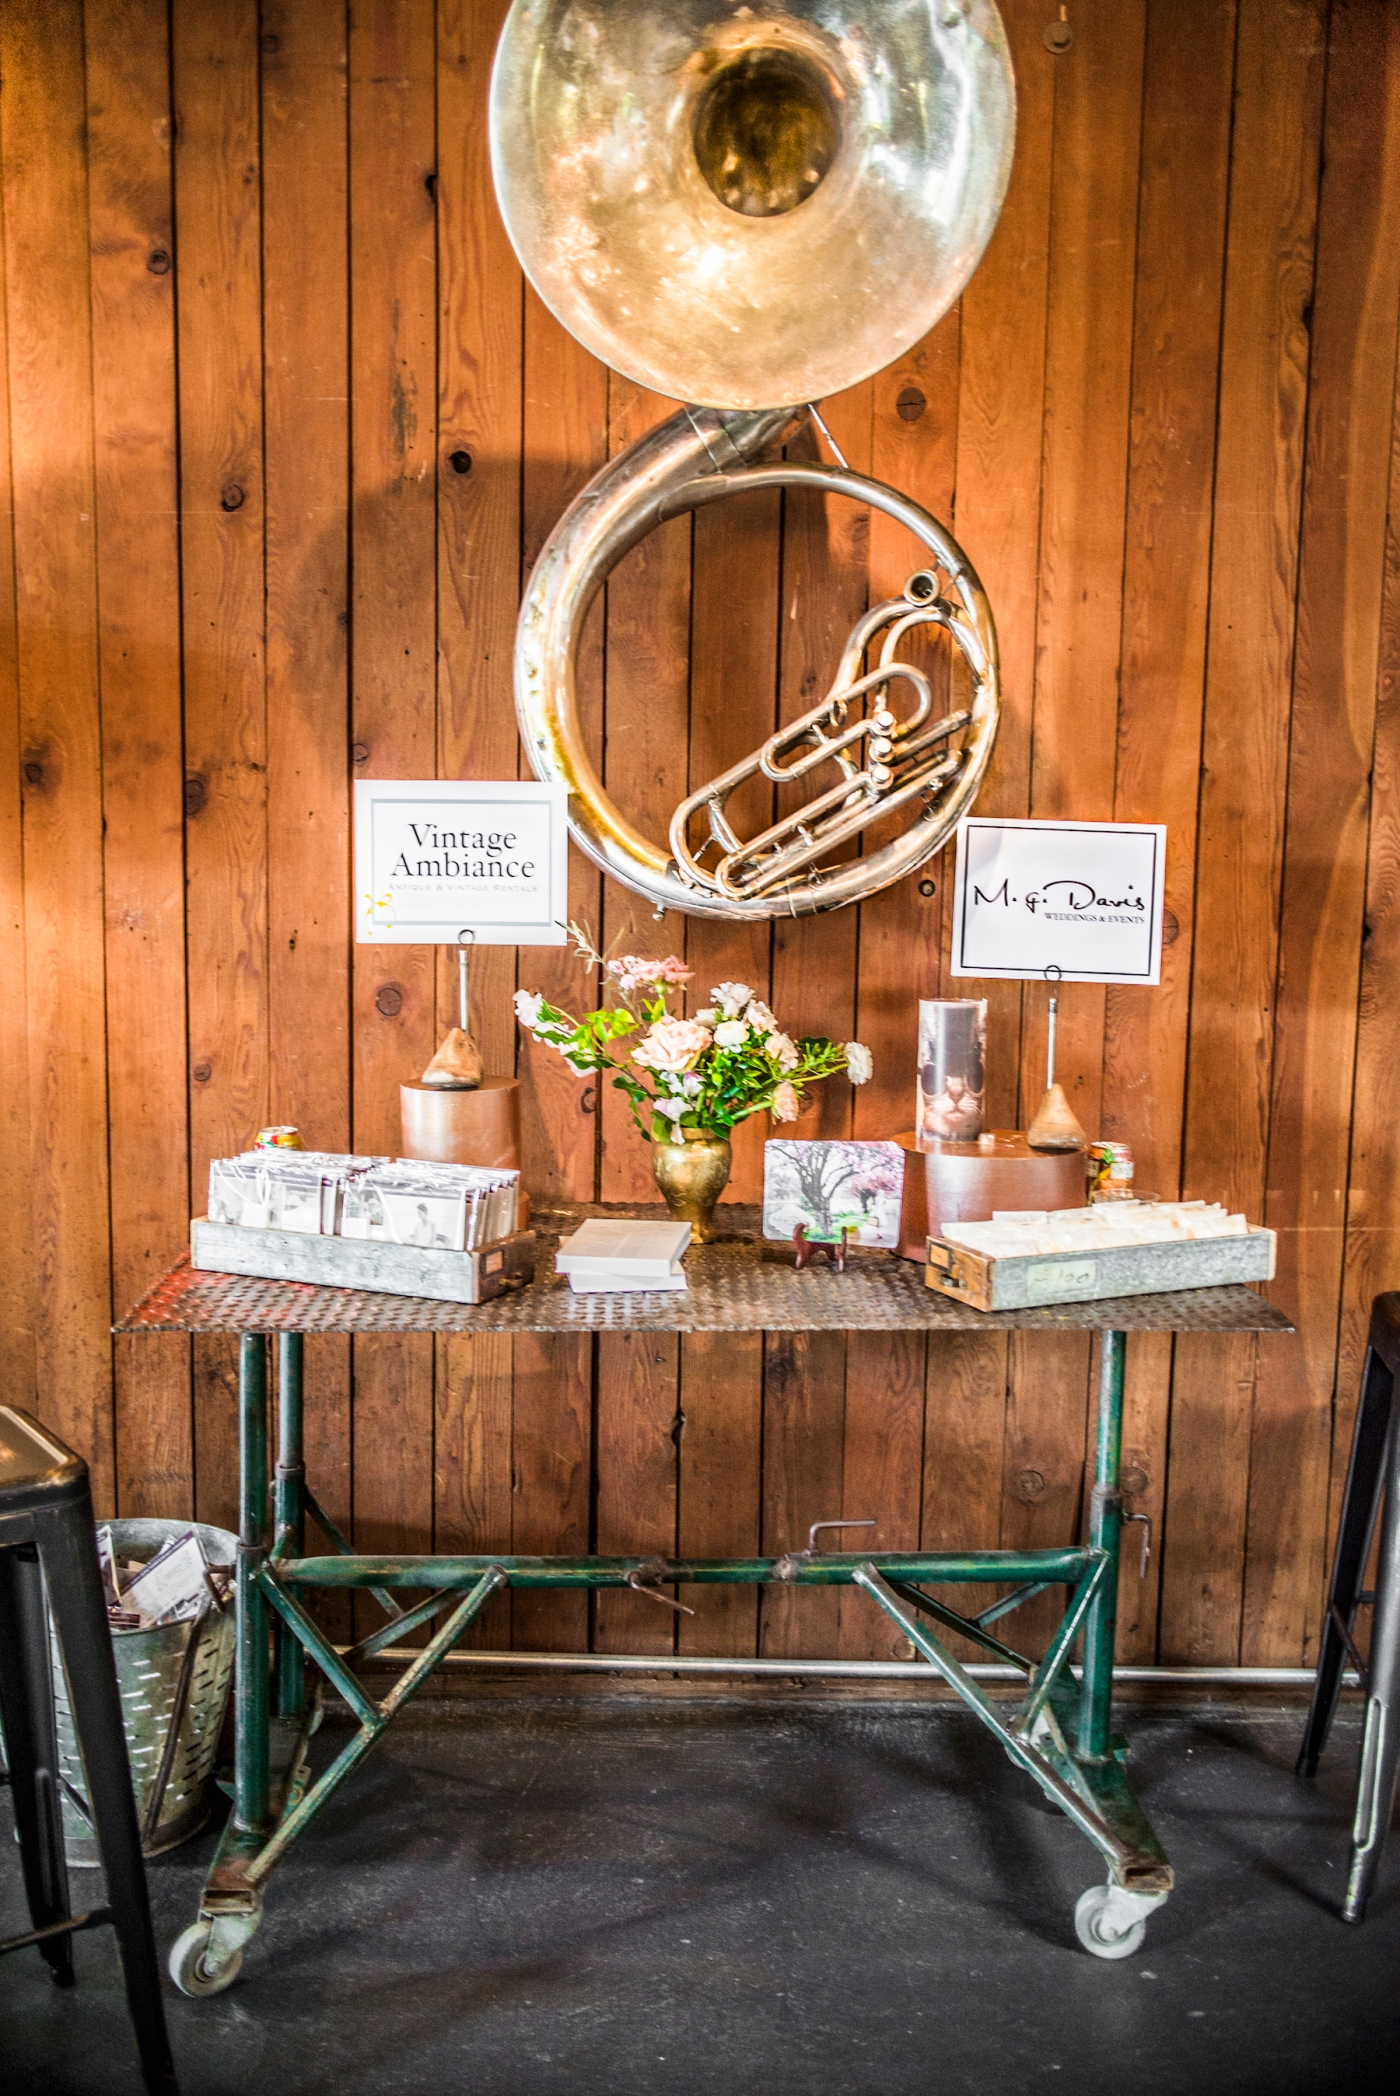 photography_by_jane_speleers_2017_wedding_show_i_do_sodo_within_designed_by_melody_davisdsc_0346